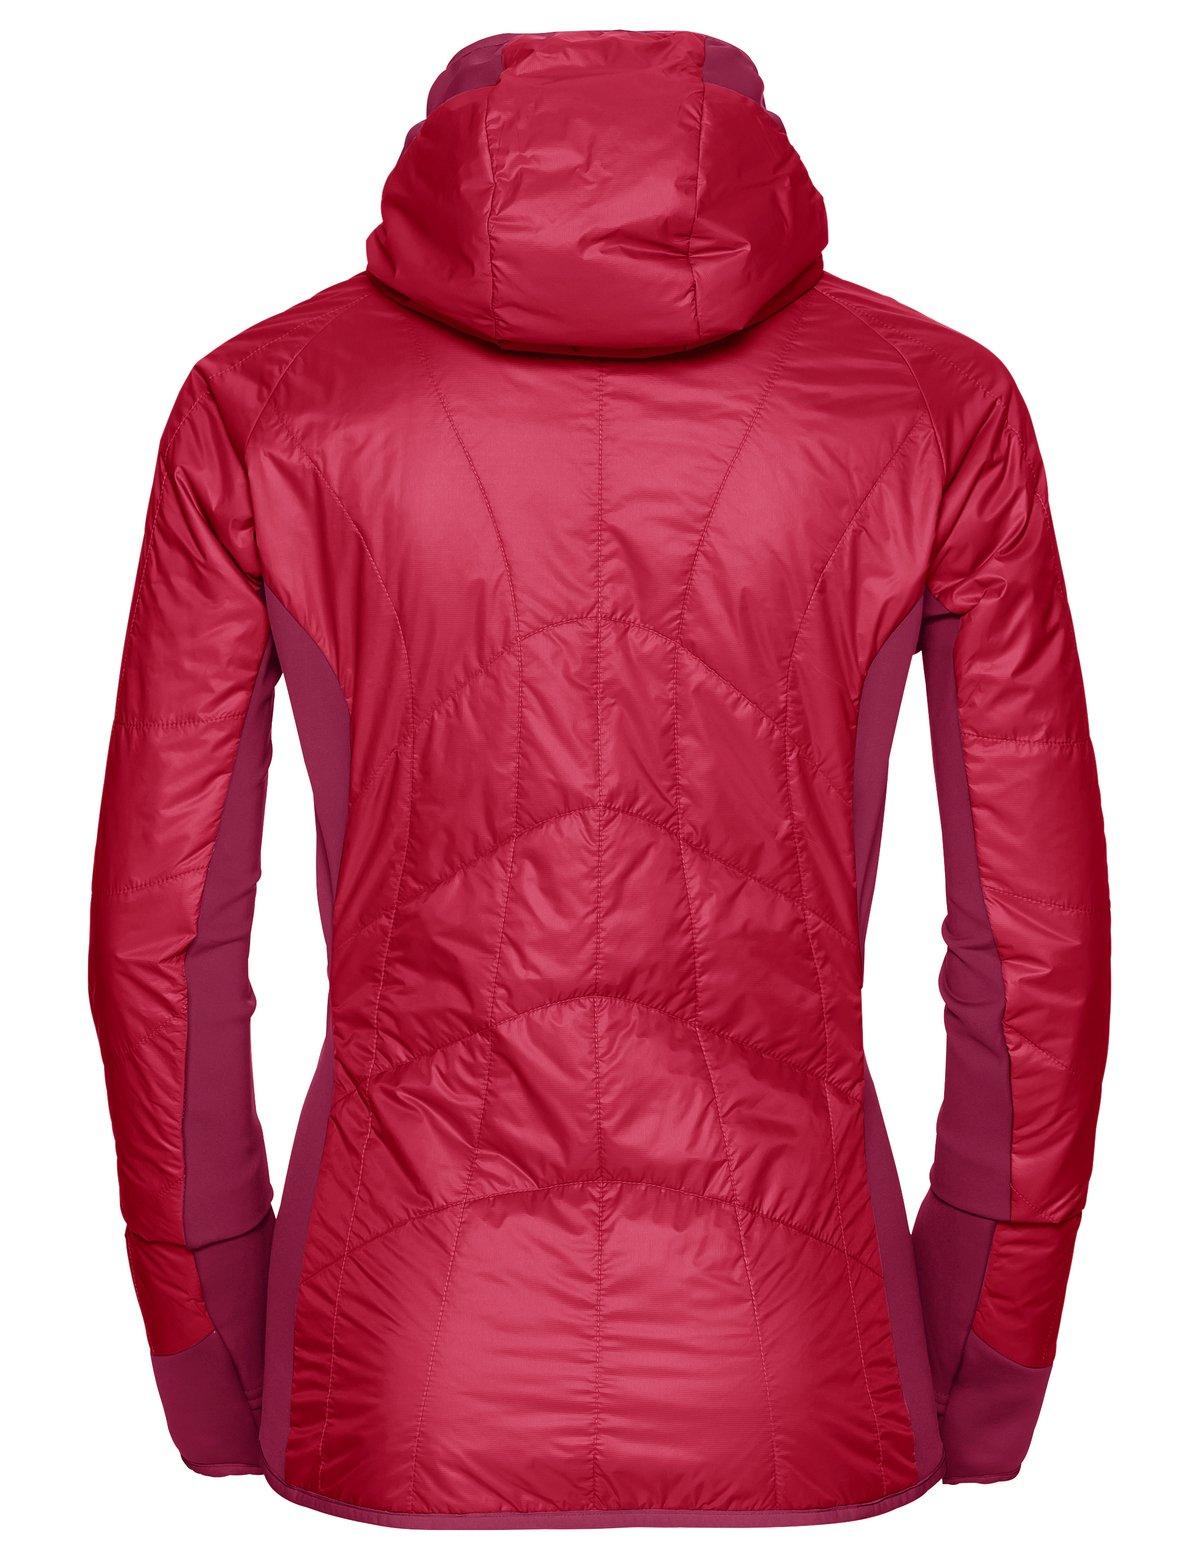 71XCk2sQ13L - Vaude Women's Sesvenna Jacket Ii